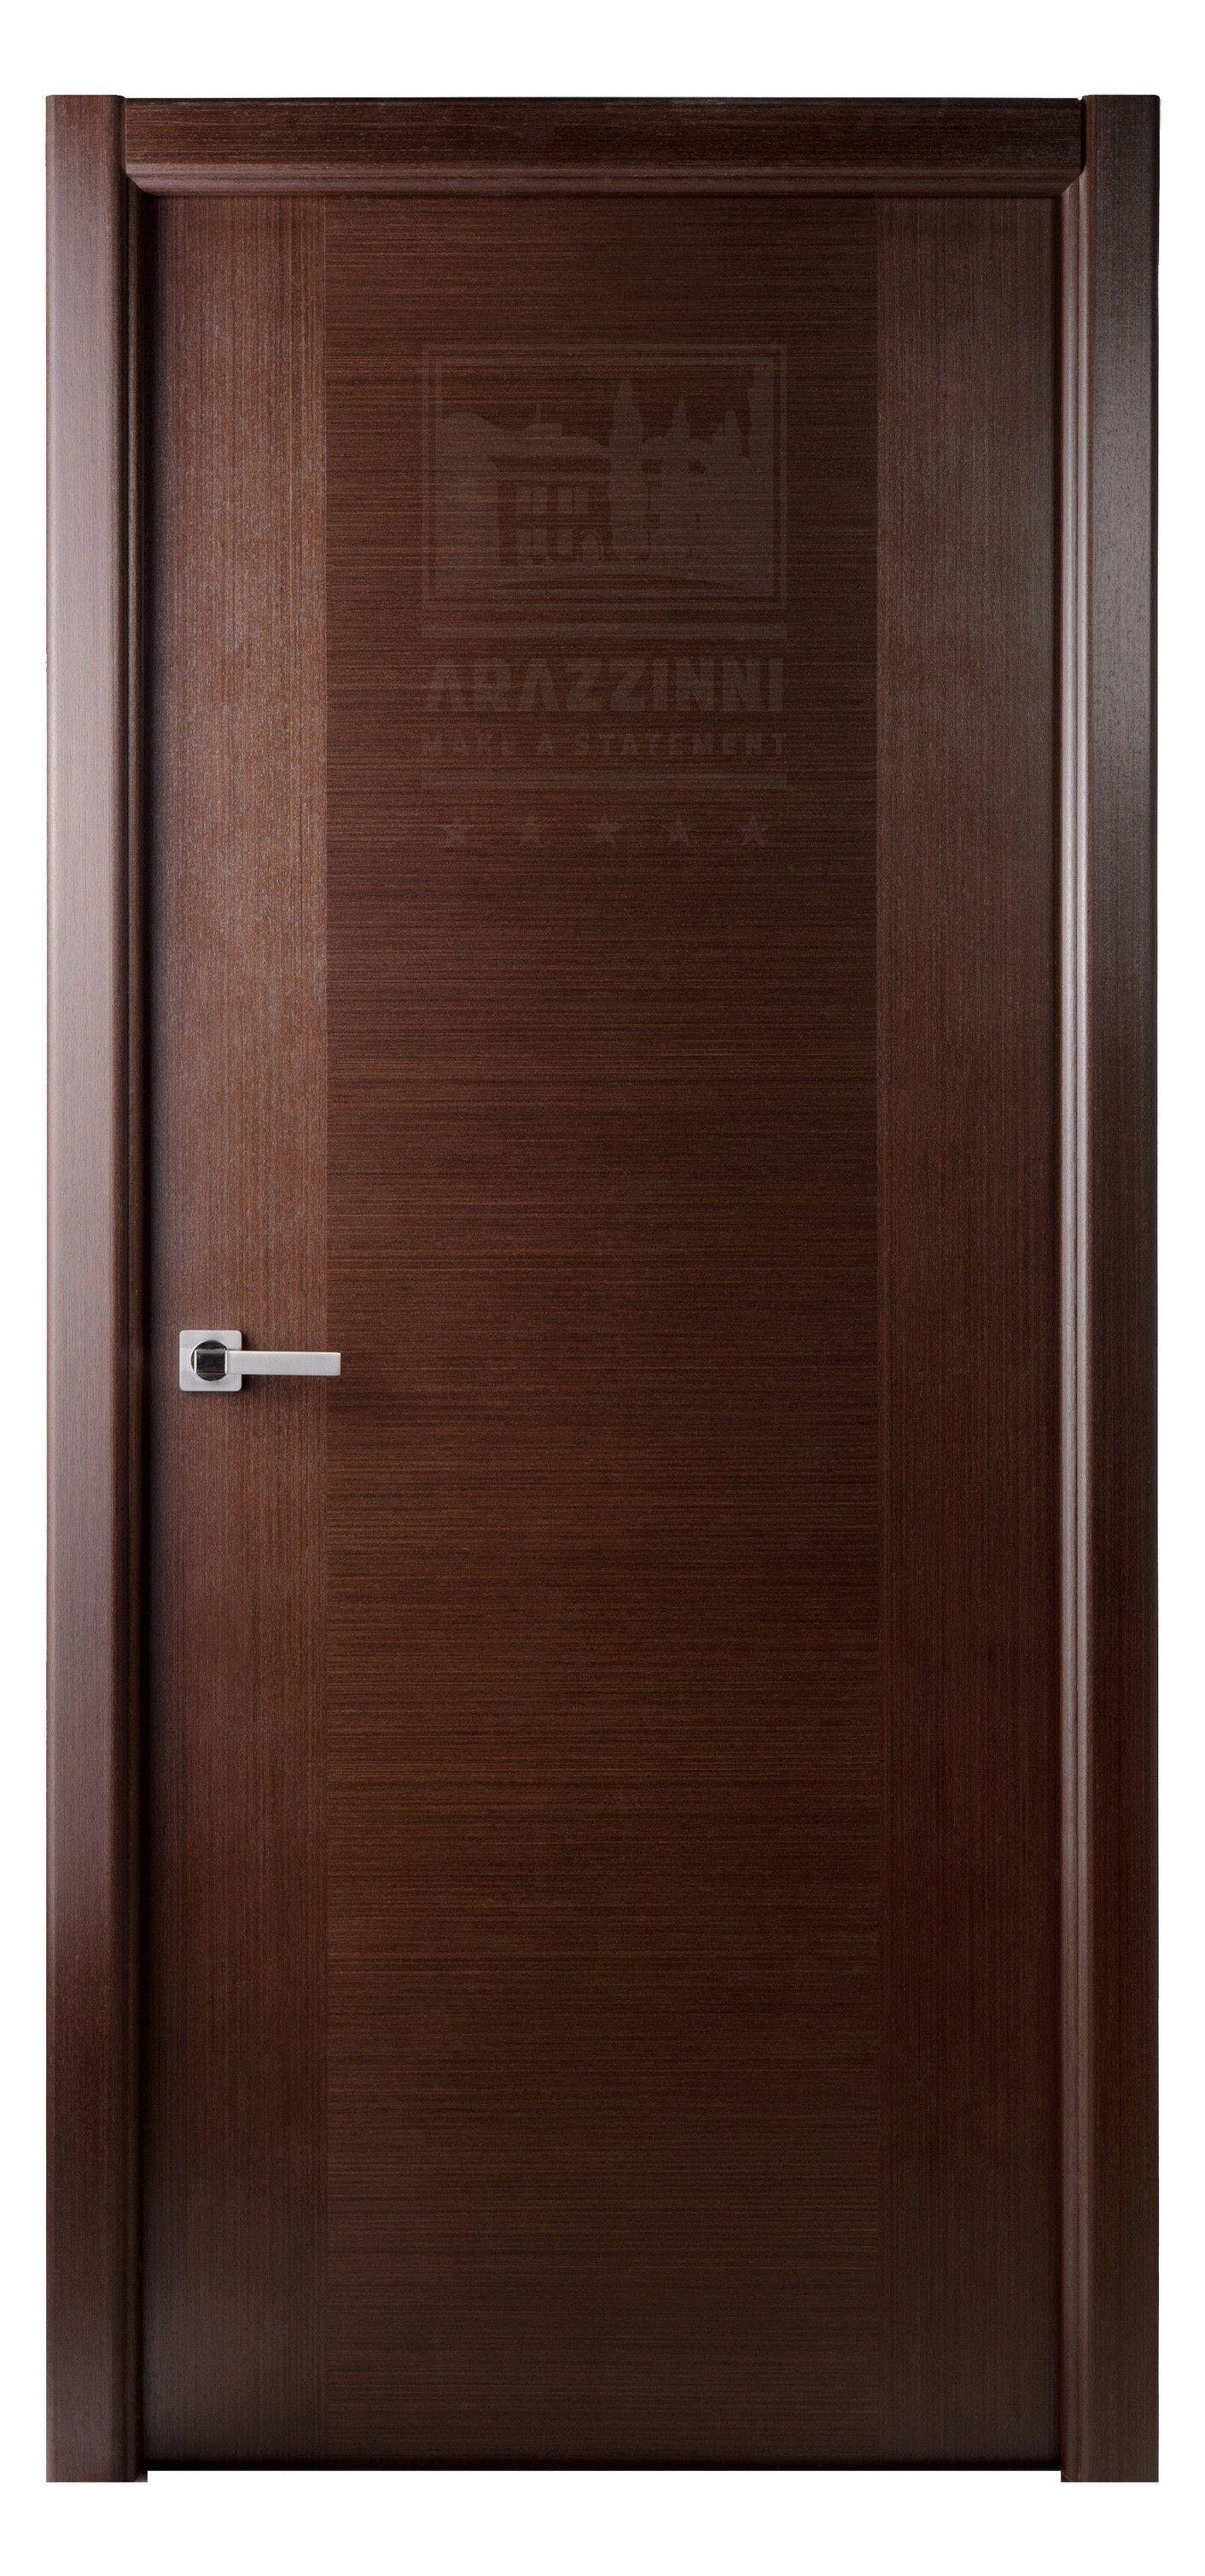 Arazzinni Classica Lux Interior Door Wenge & 33 Modern Interior Doors Creating Stylish Centerpieces for ... Pezcame.Com